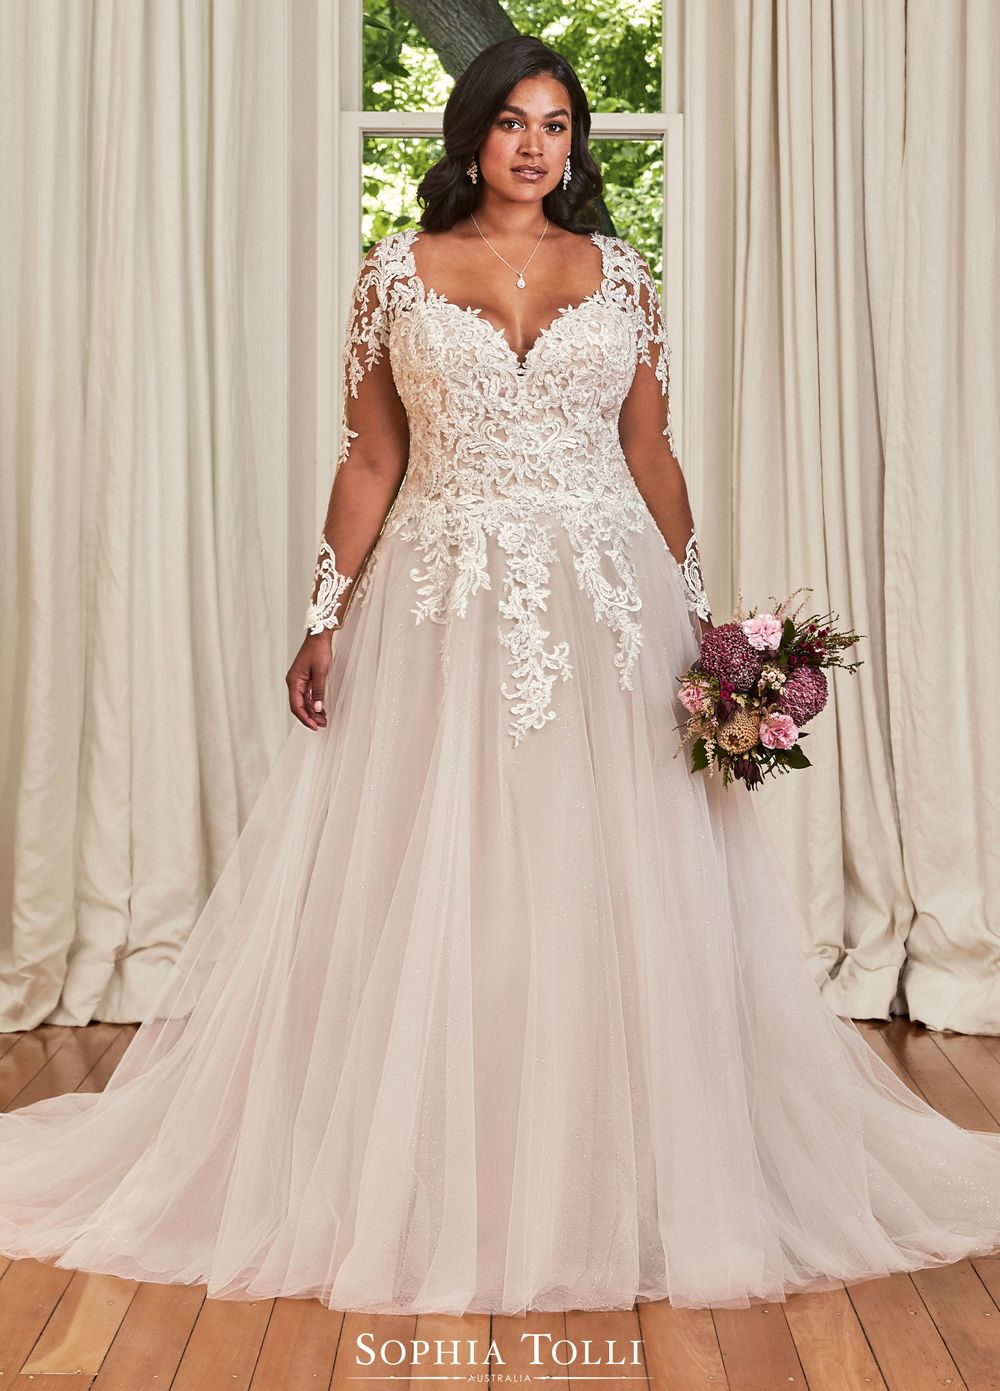 Sophia Tolli Y21977bls Stephanie Grace Illusion Back Bridal Dress Plus Wedding Dresses Wedding Dresses Wedding Dresses Plus Size [ 1391 x 1000 Pixel ]